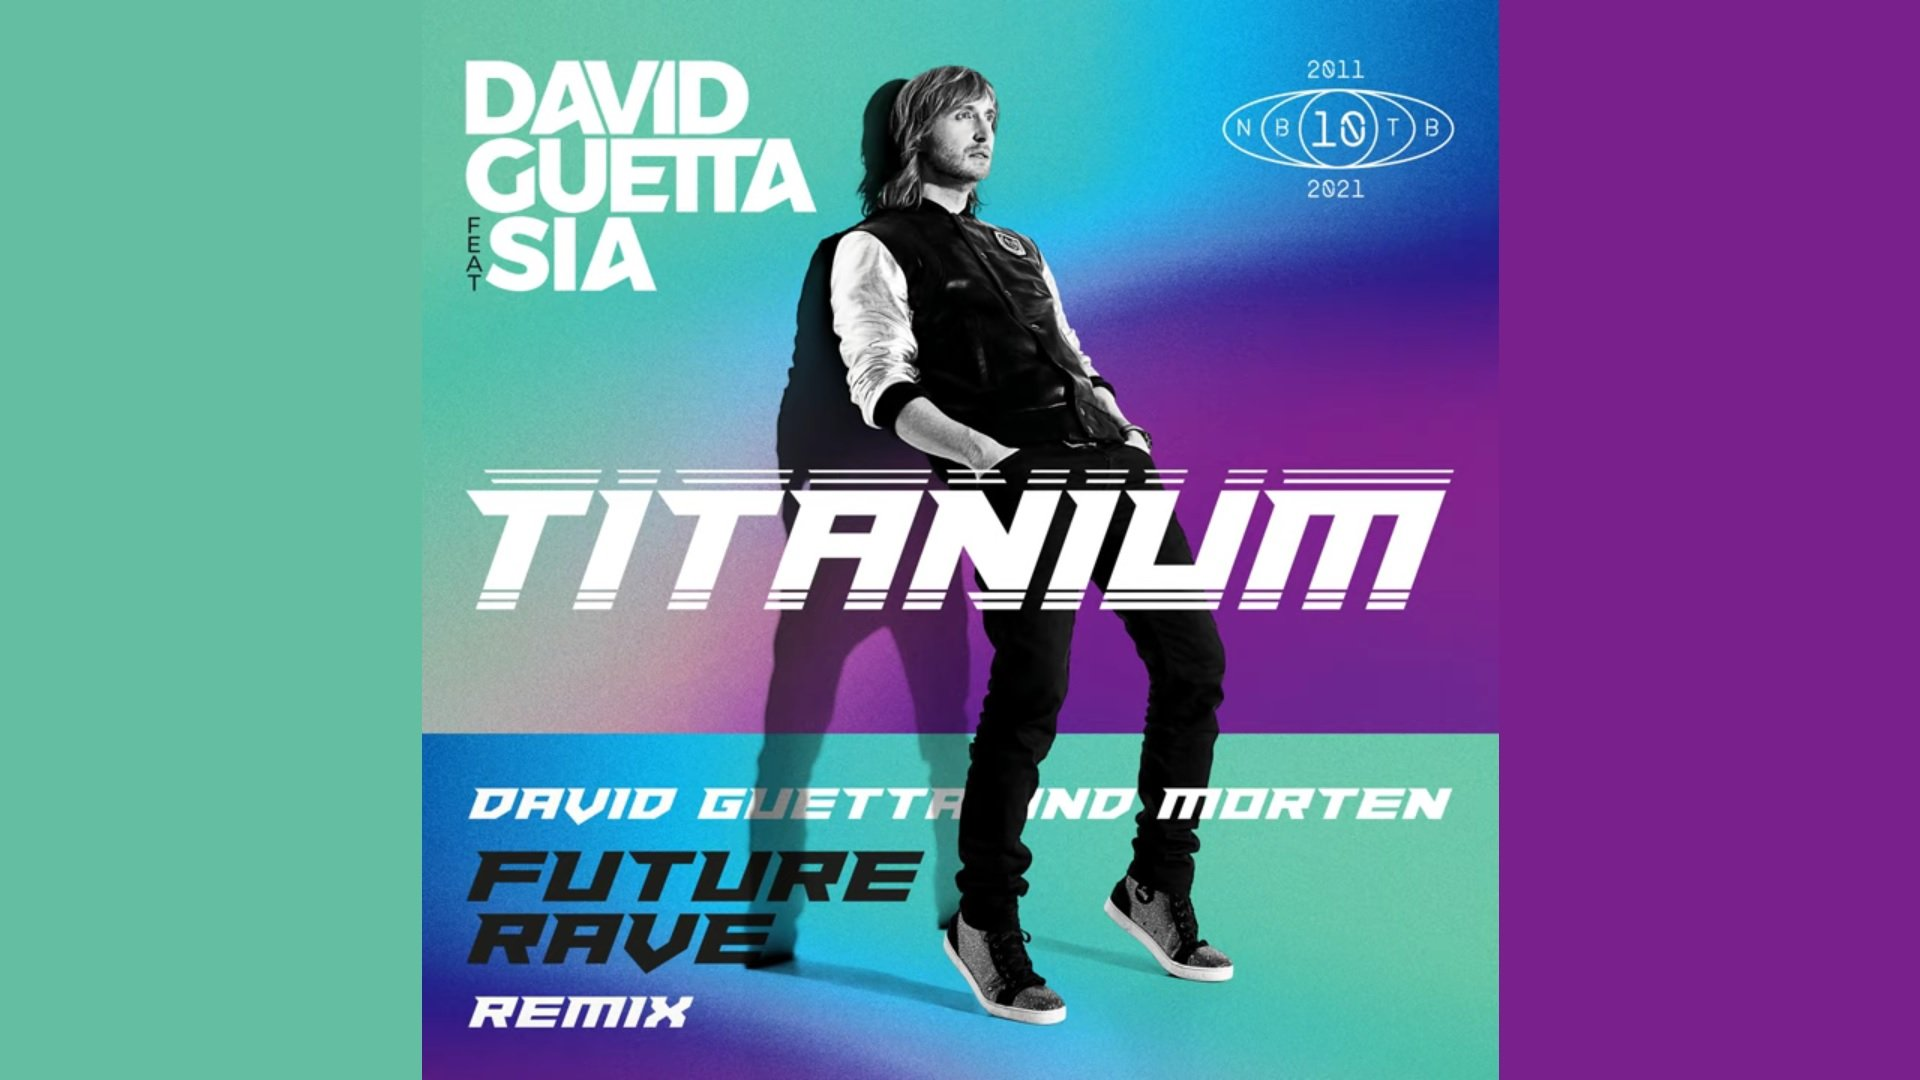 David Guetta ft Sia - TITANIUM 2021 - David Guetta & MORTEN Future Rave Remix 2021